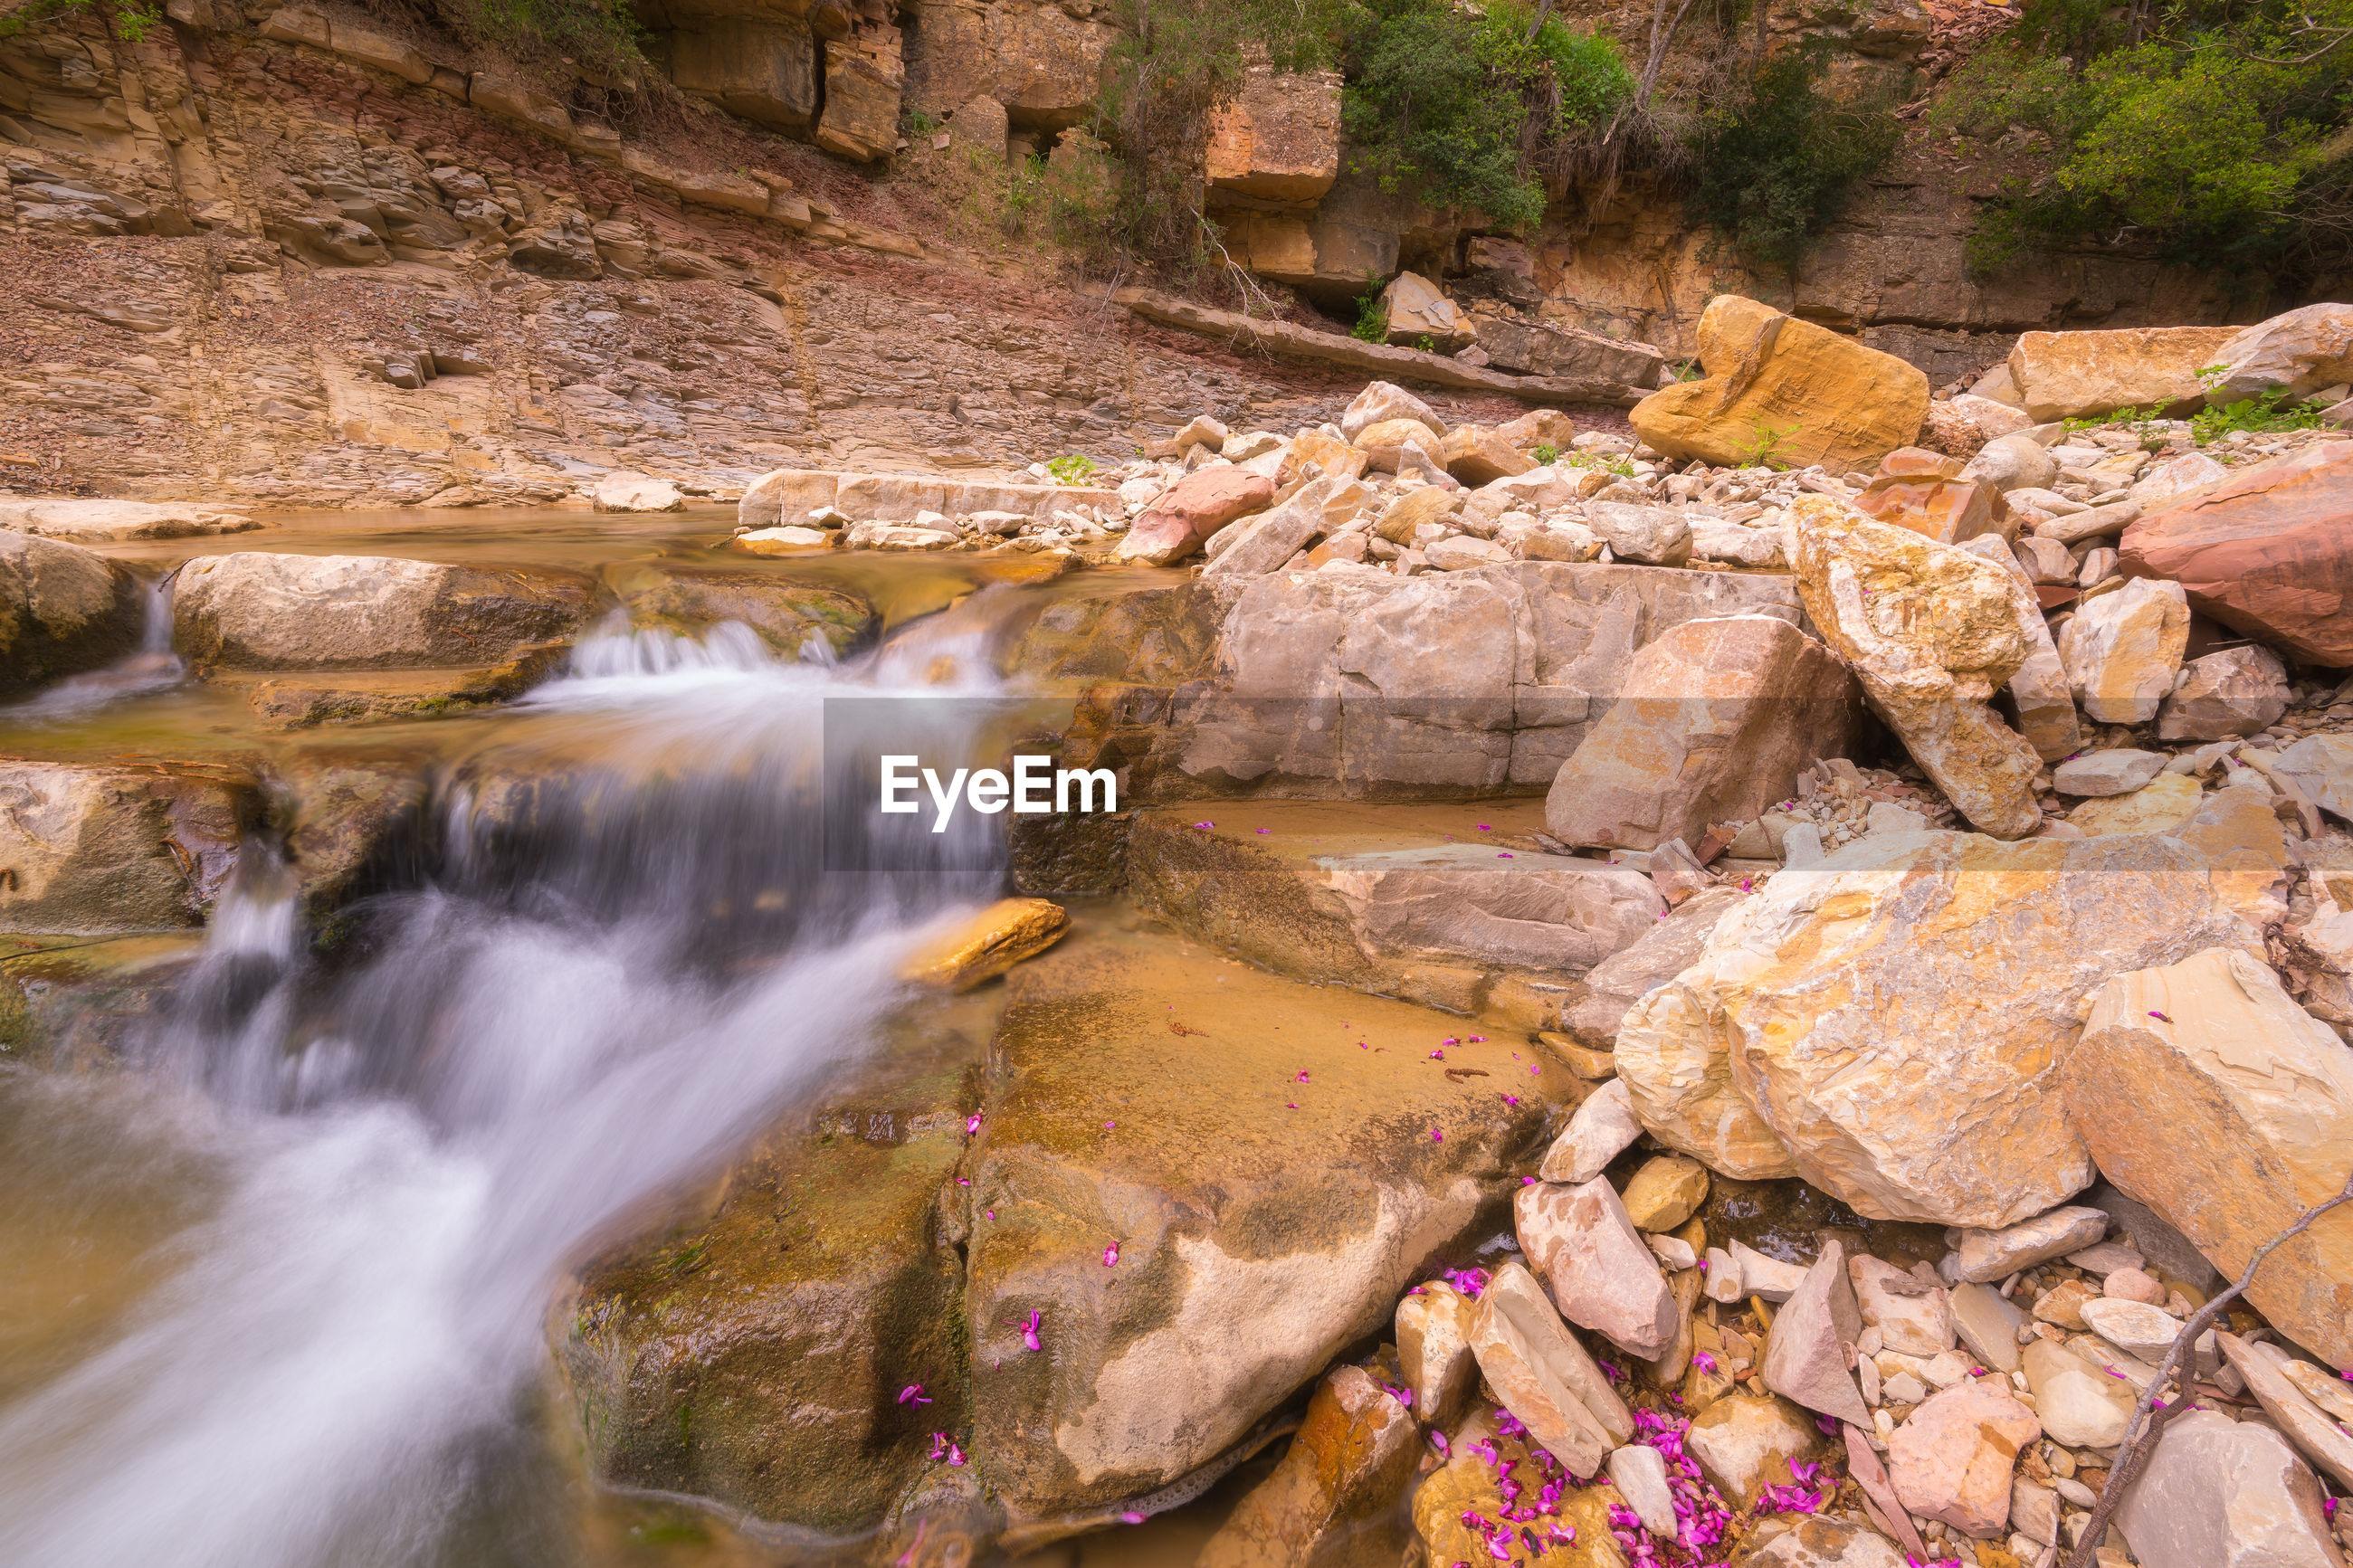 SCENIC VIEW OF WATERFALL ALONG ROCKS